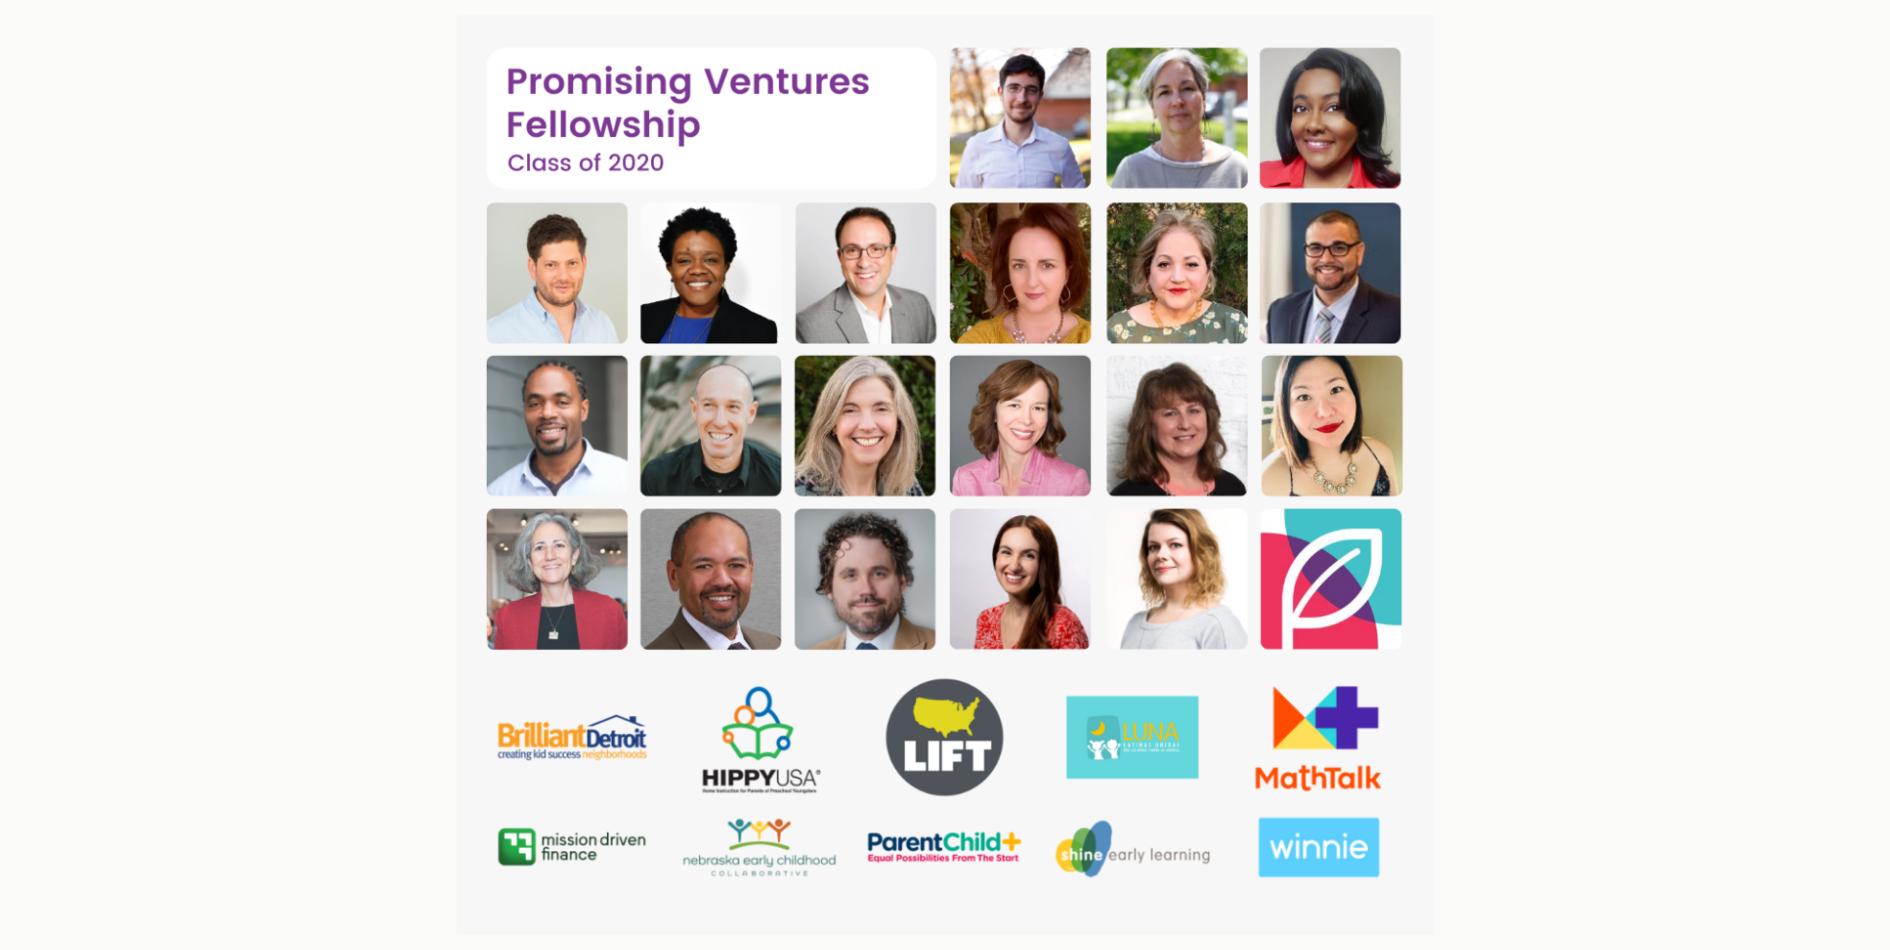 Promising Ventures Fellowship Class of 2020